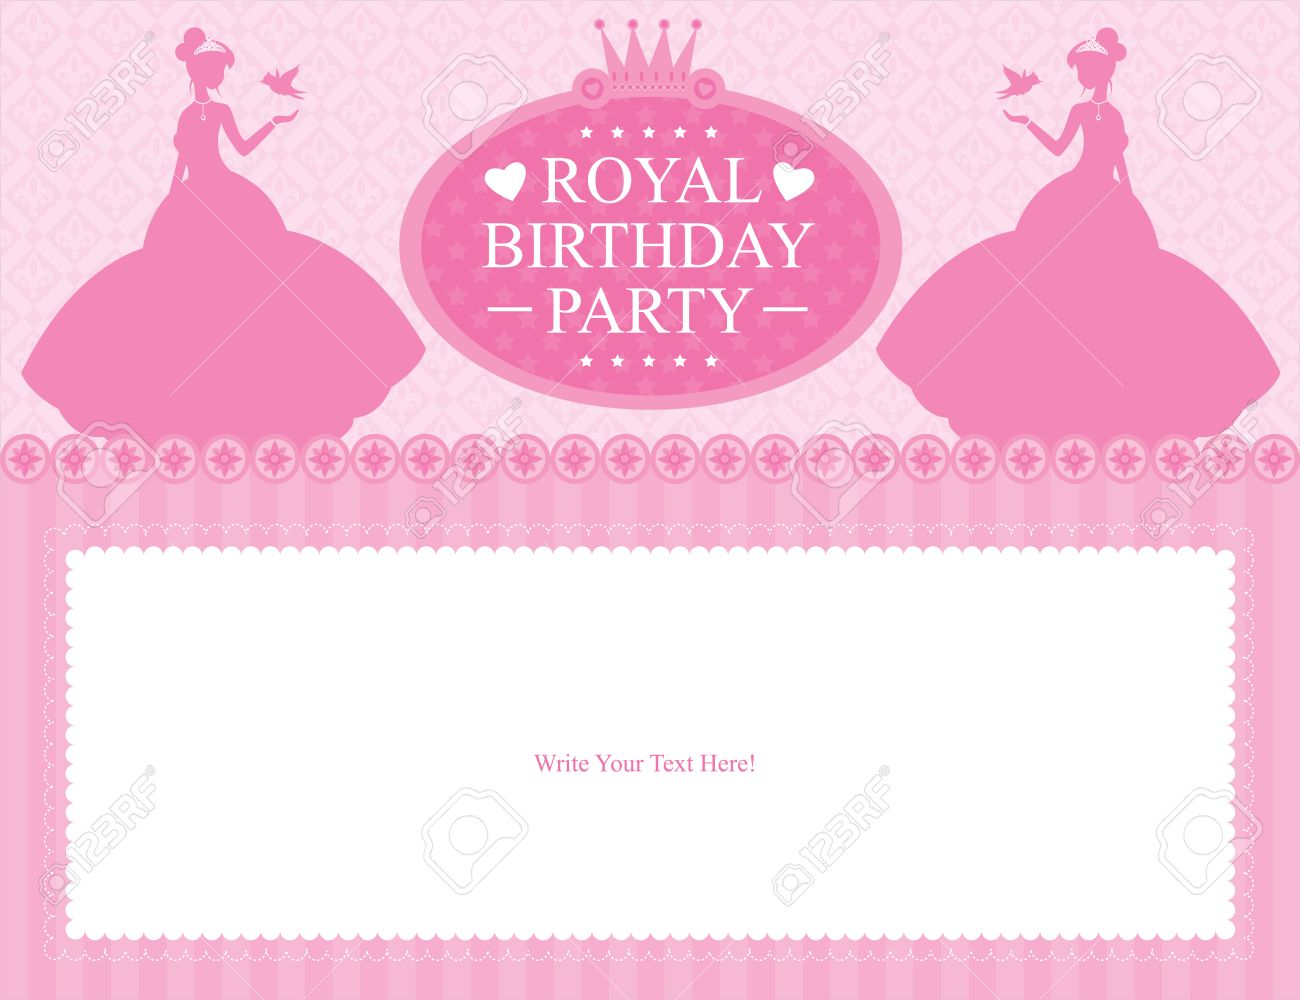 Birthday Princess Card Design Royalty Free Cliparts Vectors And